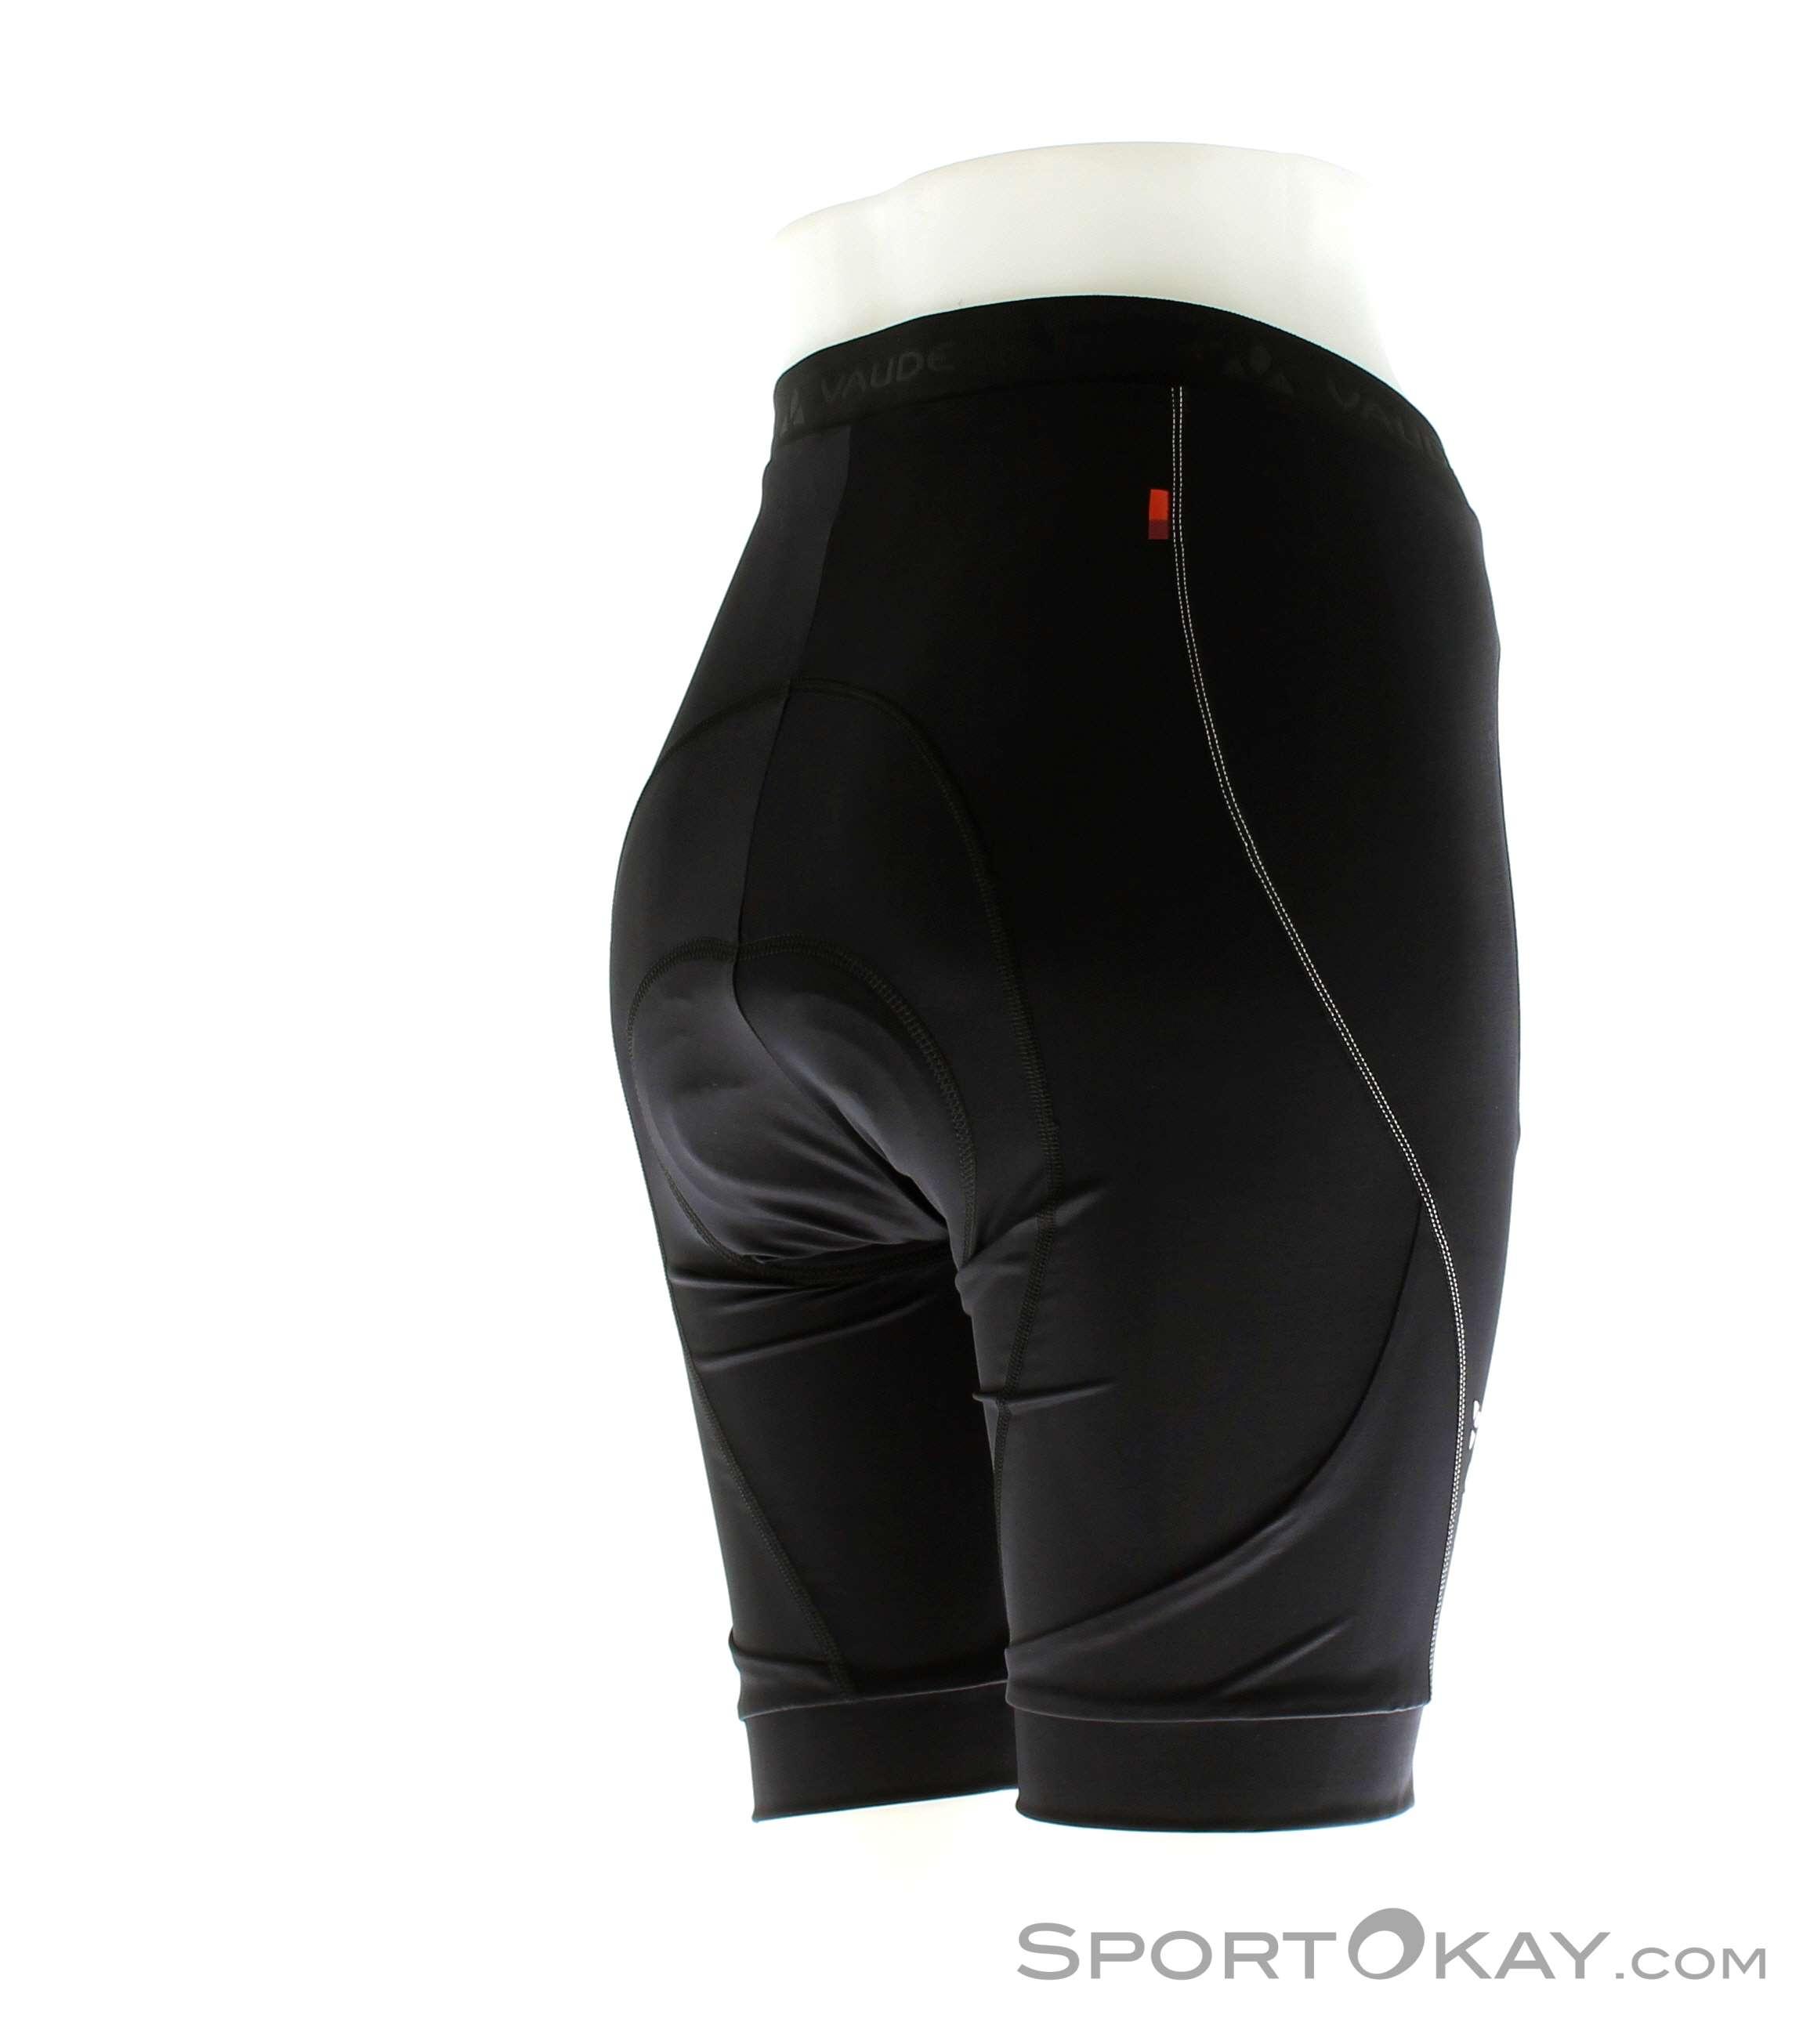 6ae1f4d54 Vaude Advanced Pants II Womens Biking Shorts - Pants - Bike Clothing ...